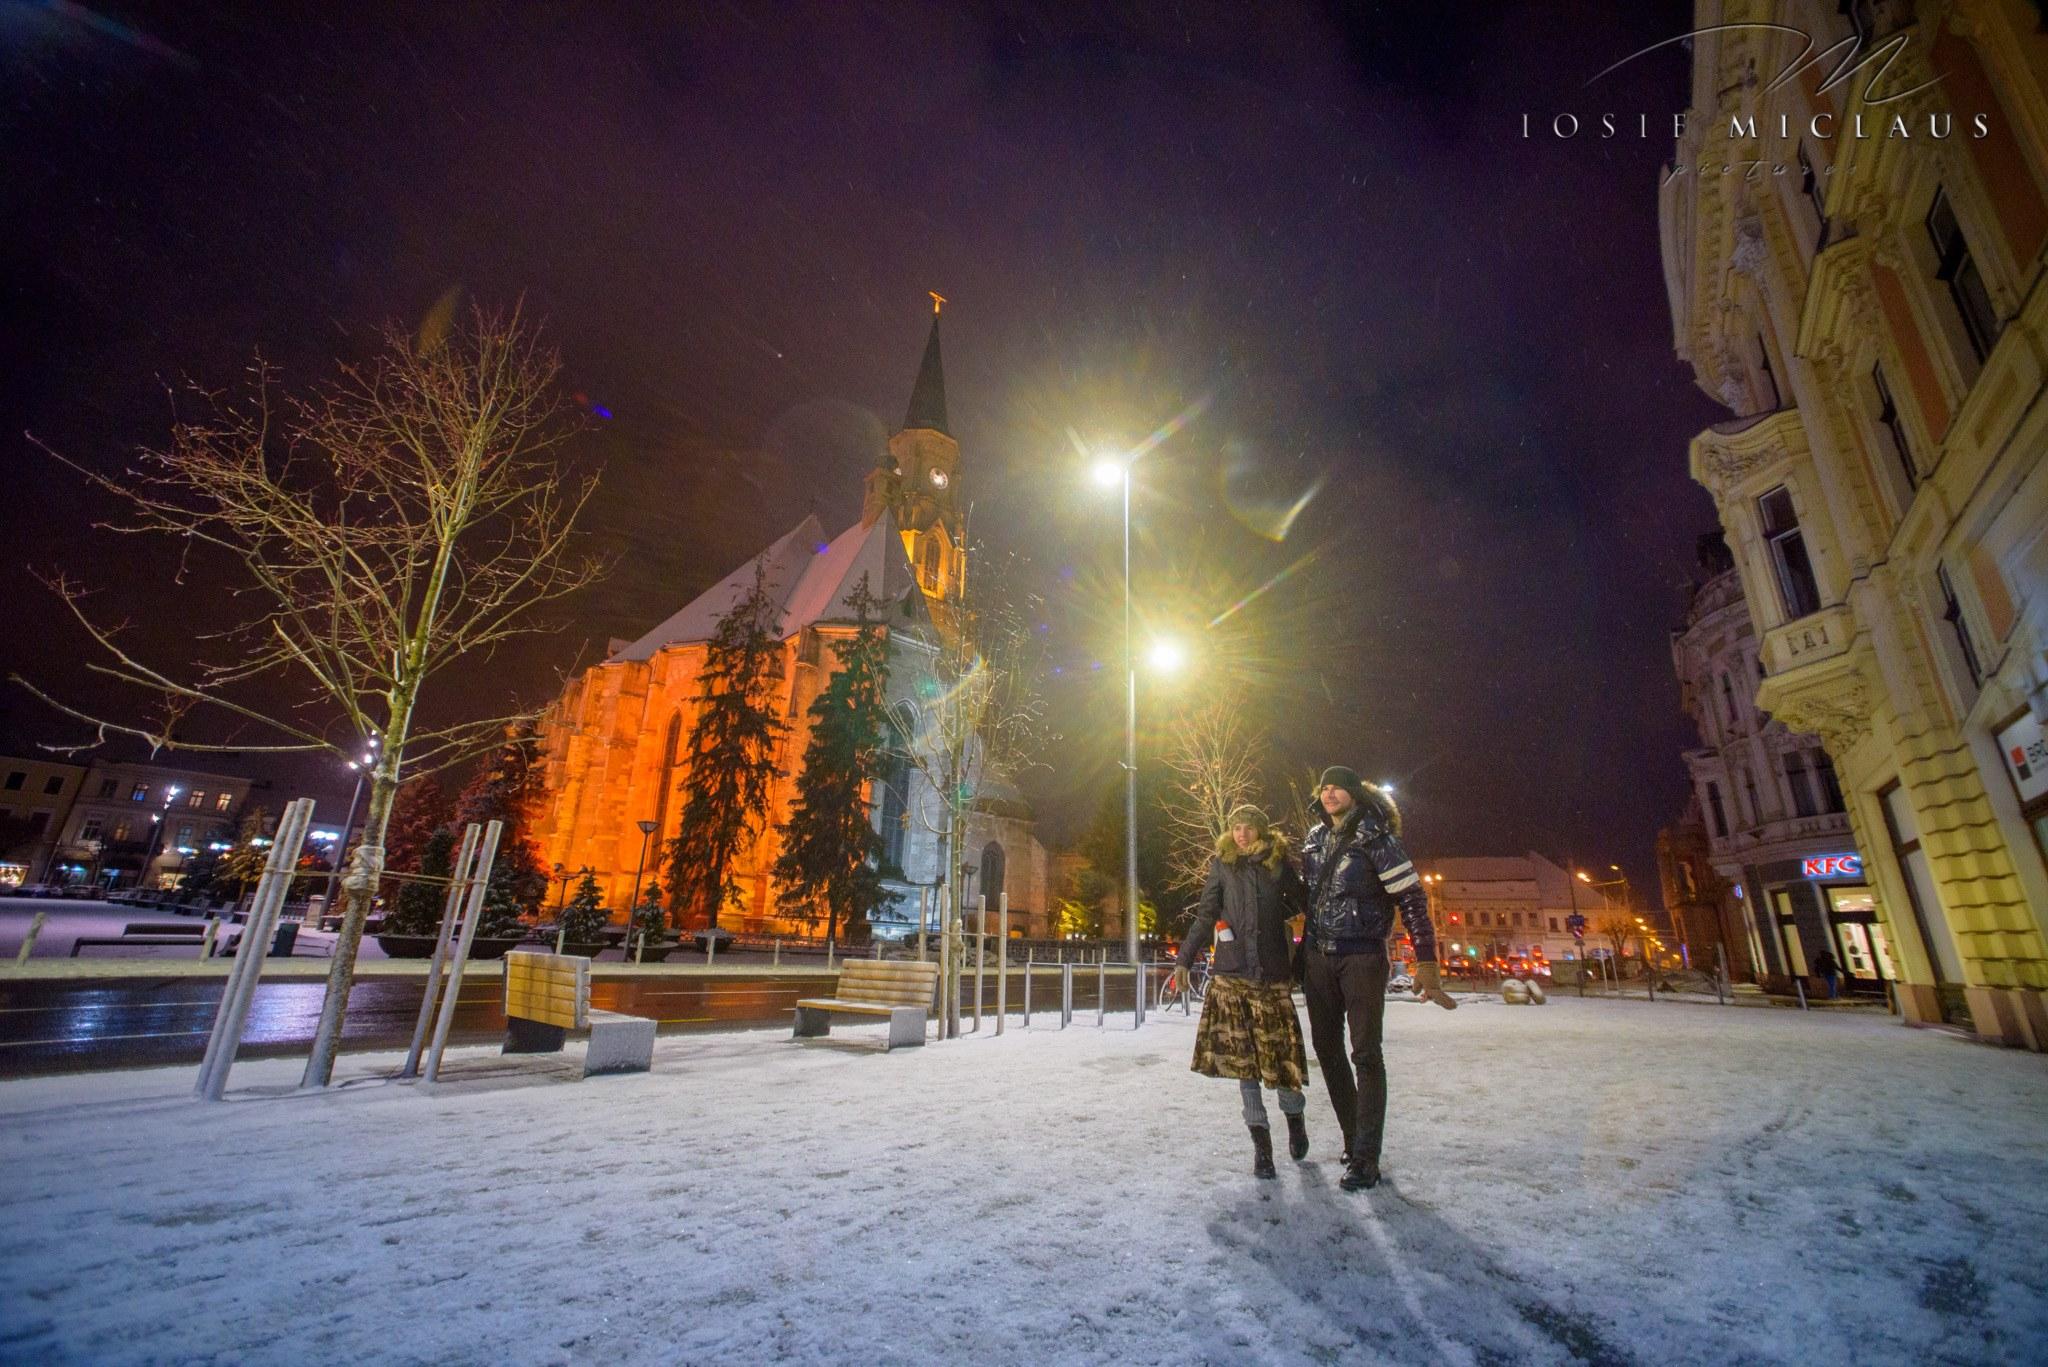 Iosif Miclaus Photographer 3 .jpg